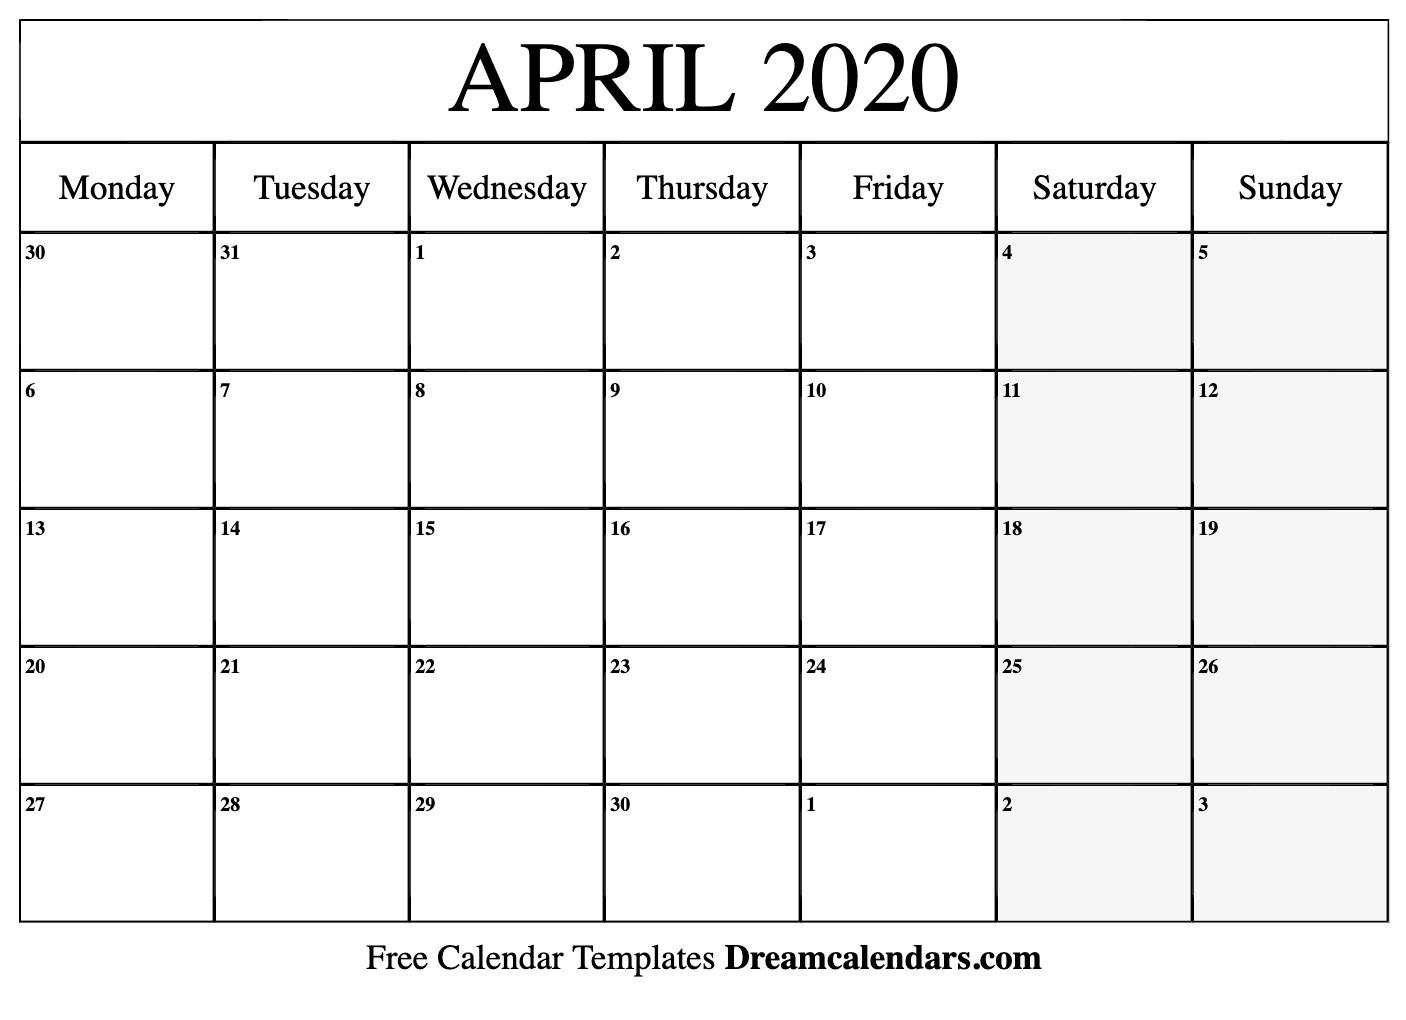 Printable April 2020 Calendar for Calendar 2020 Printable Calendar Starting With Monday